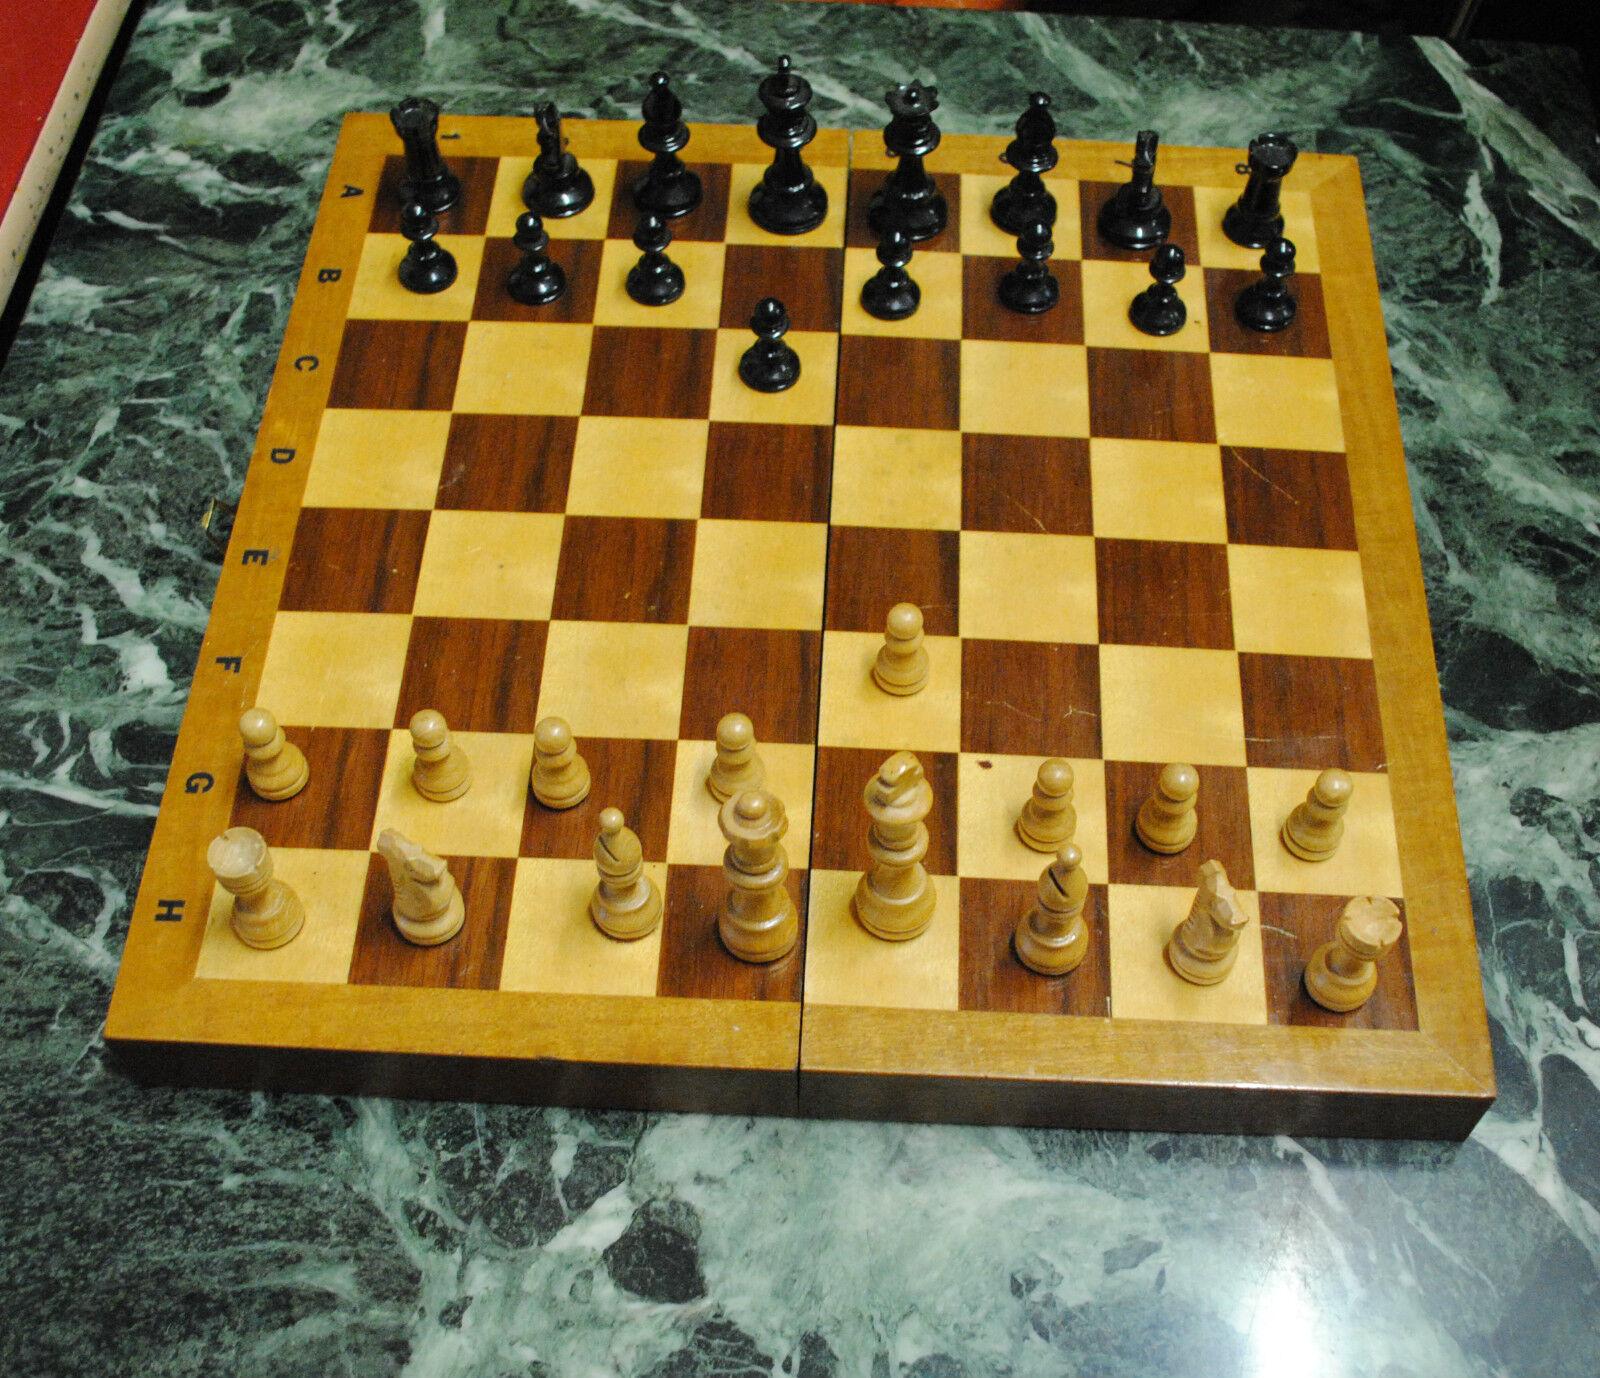 Schachspiel Schachbrett als Kiste Schachfiguren Holz älter Spiel game